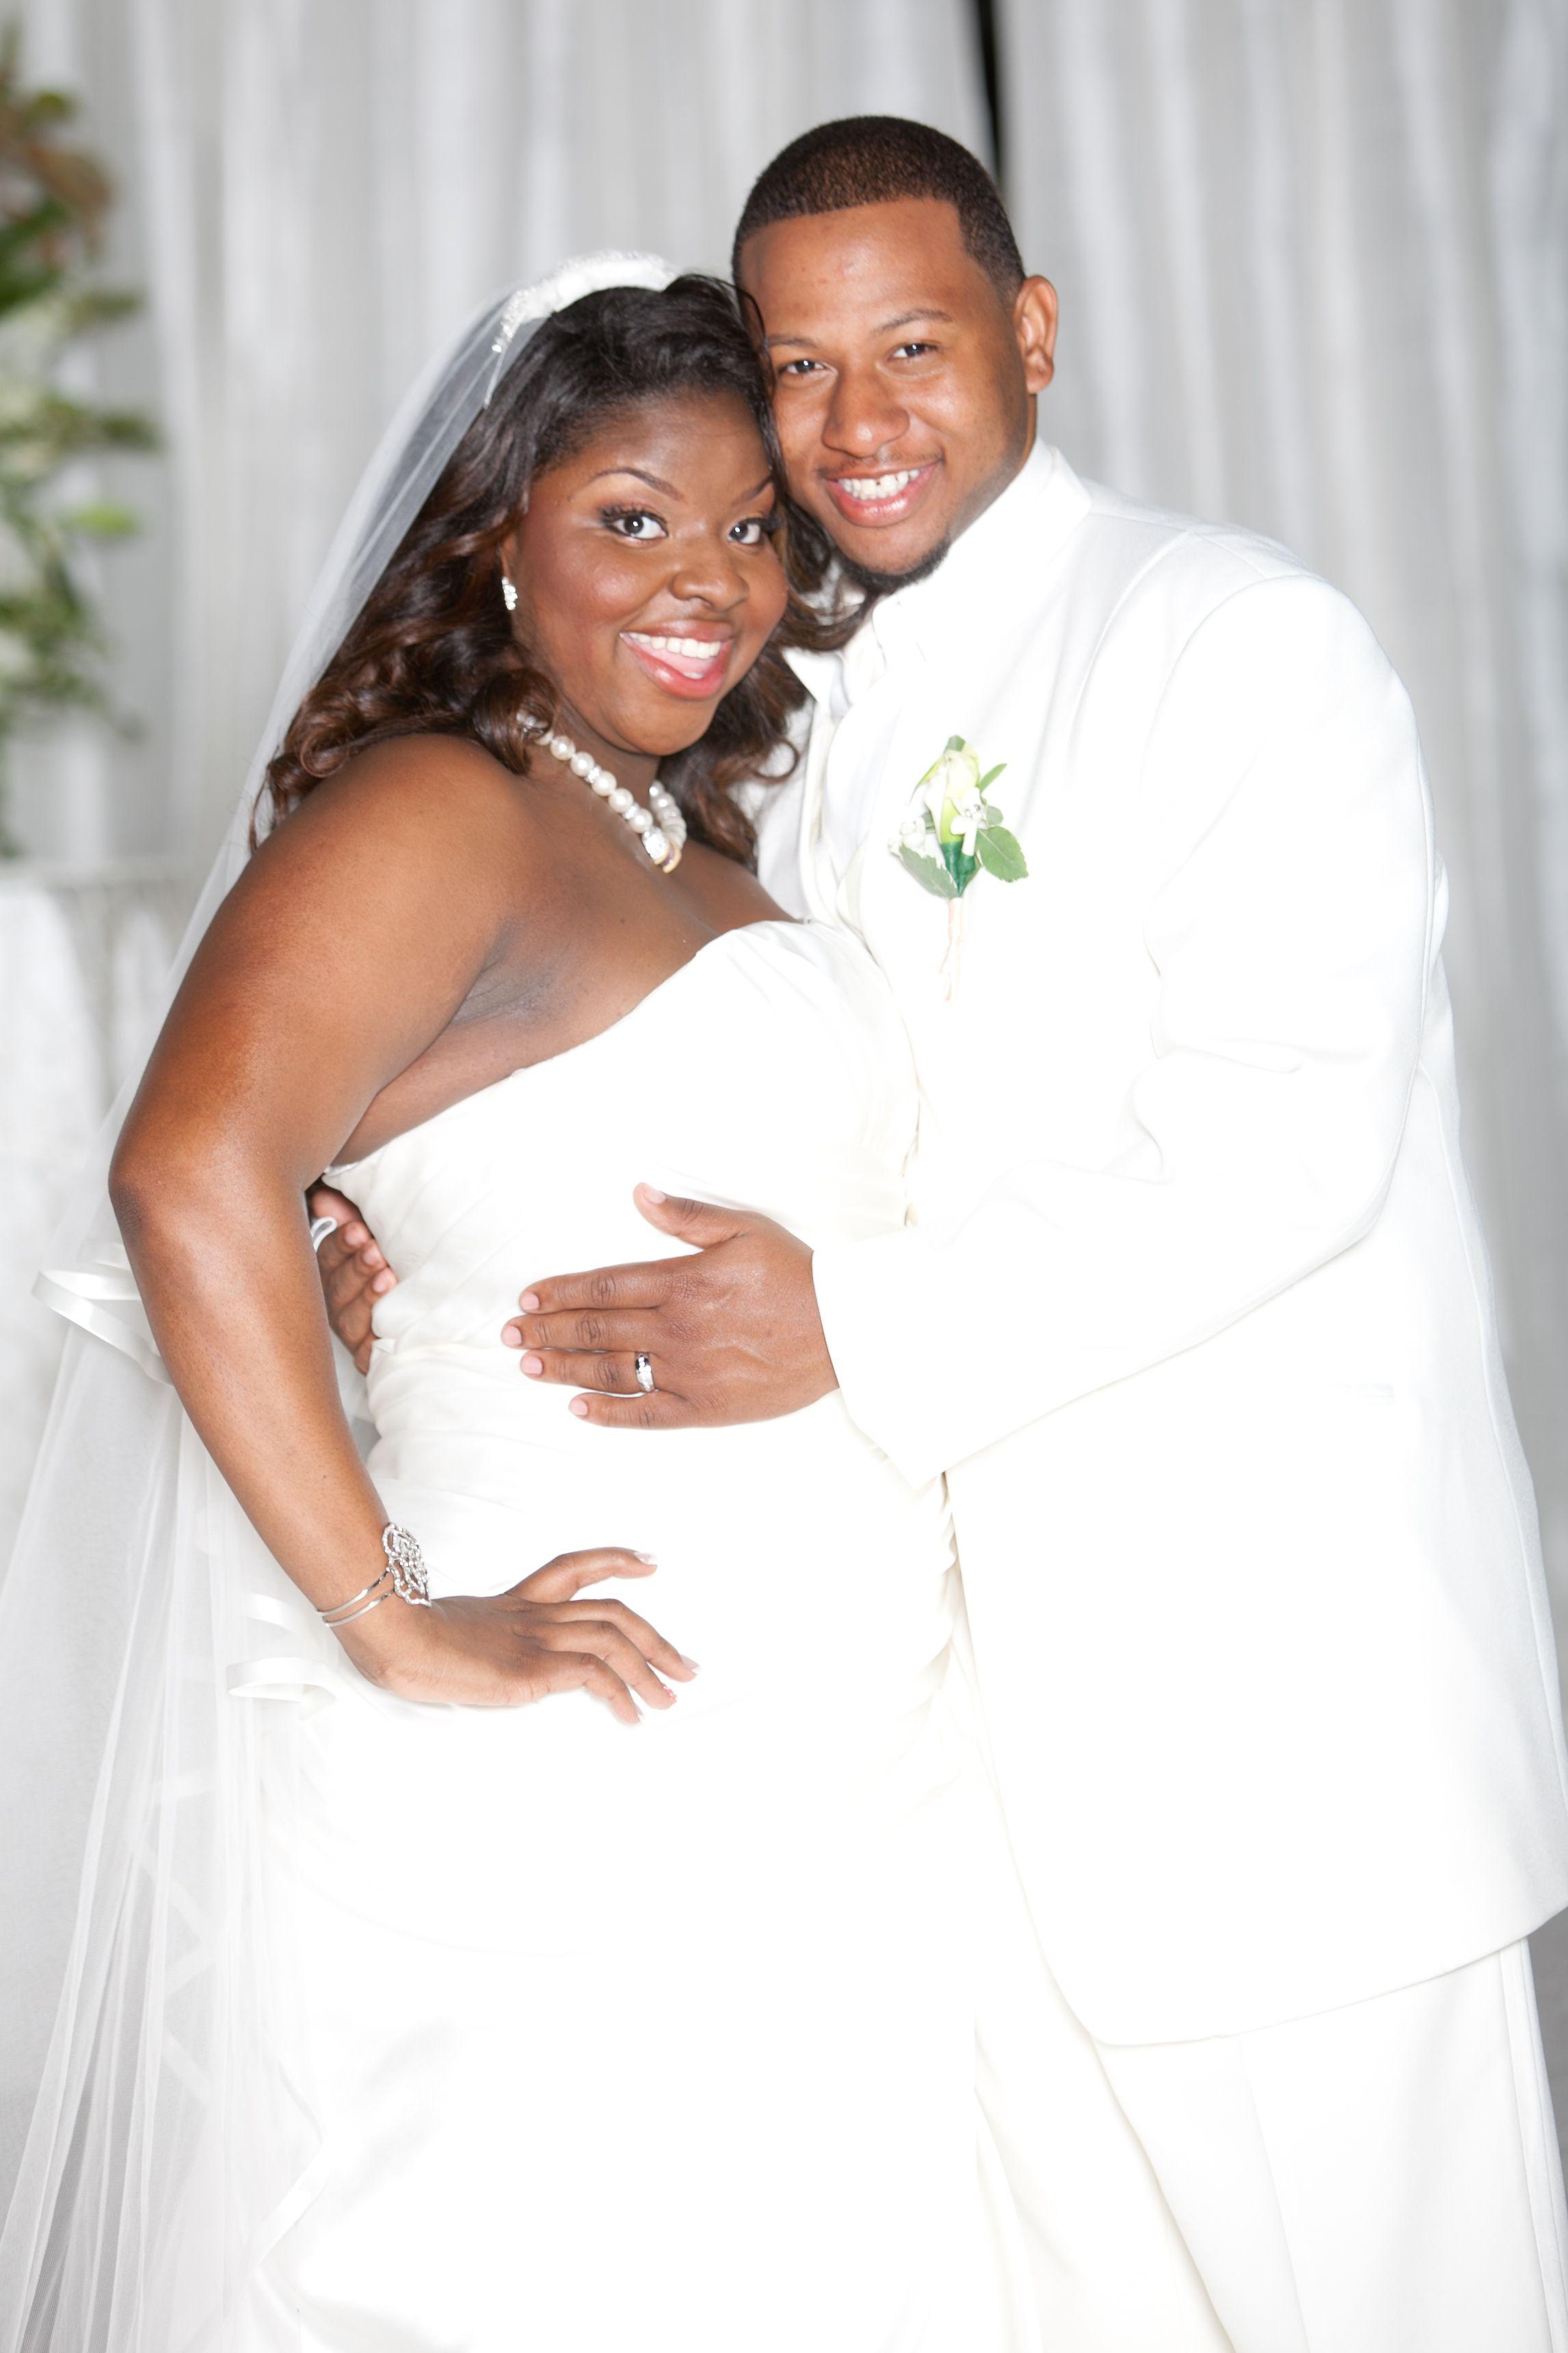 Image result for cora jakes coleman wedding | Celebrity